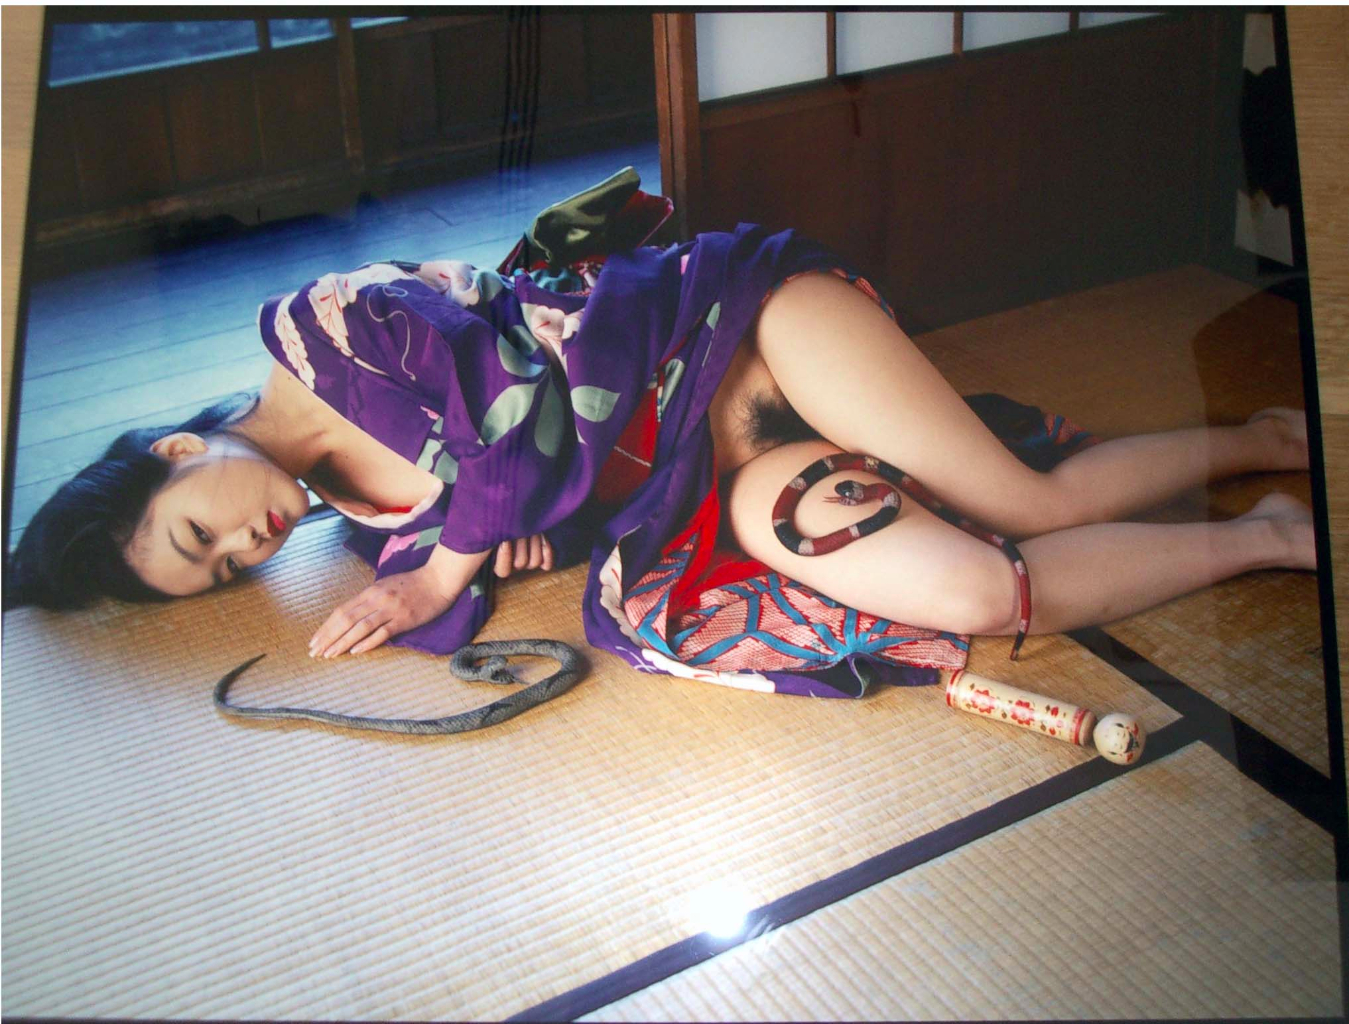 nobuyoshi-araki-from-as-paradise-1342604003_org